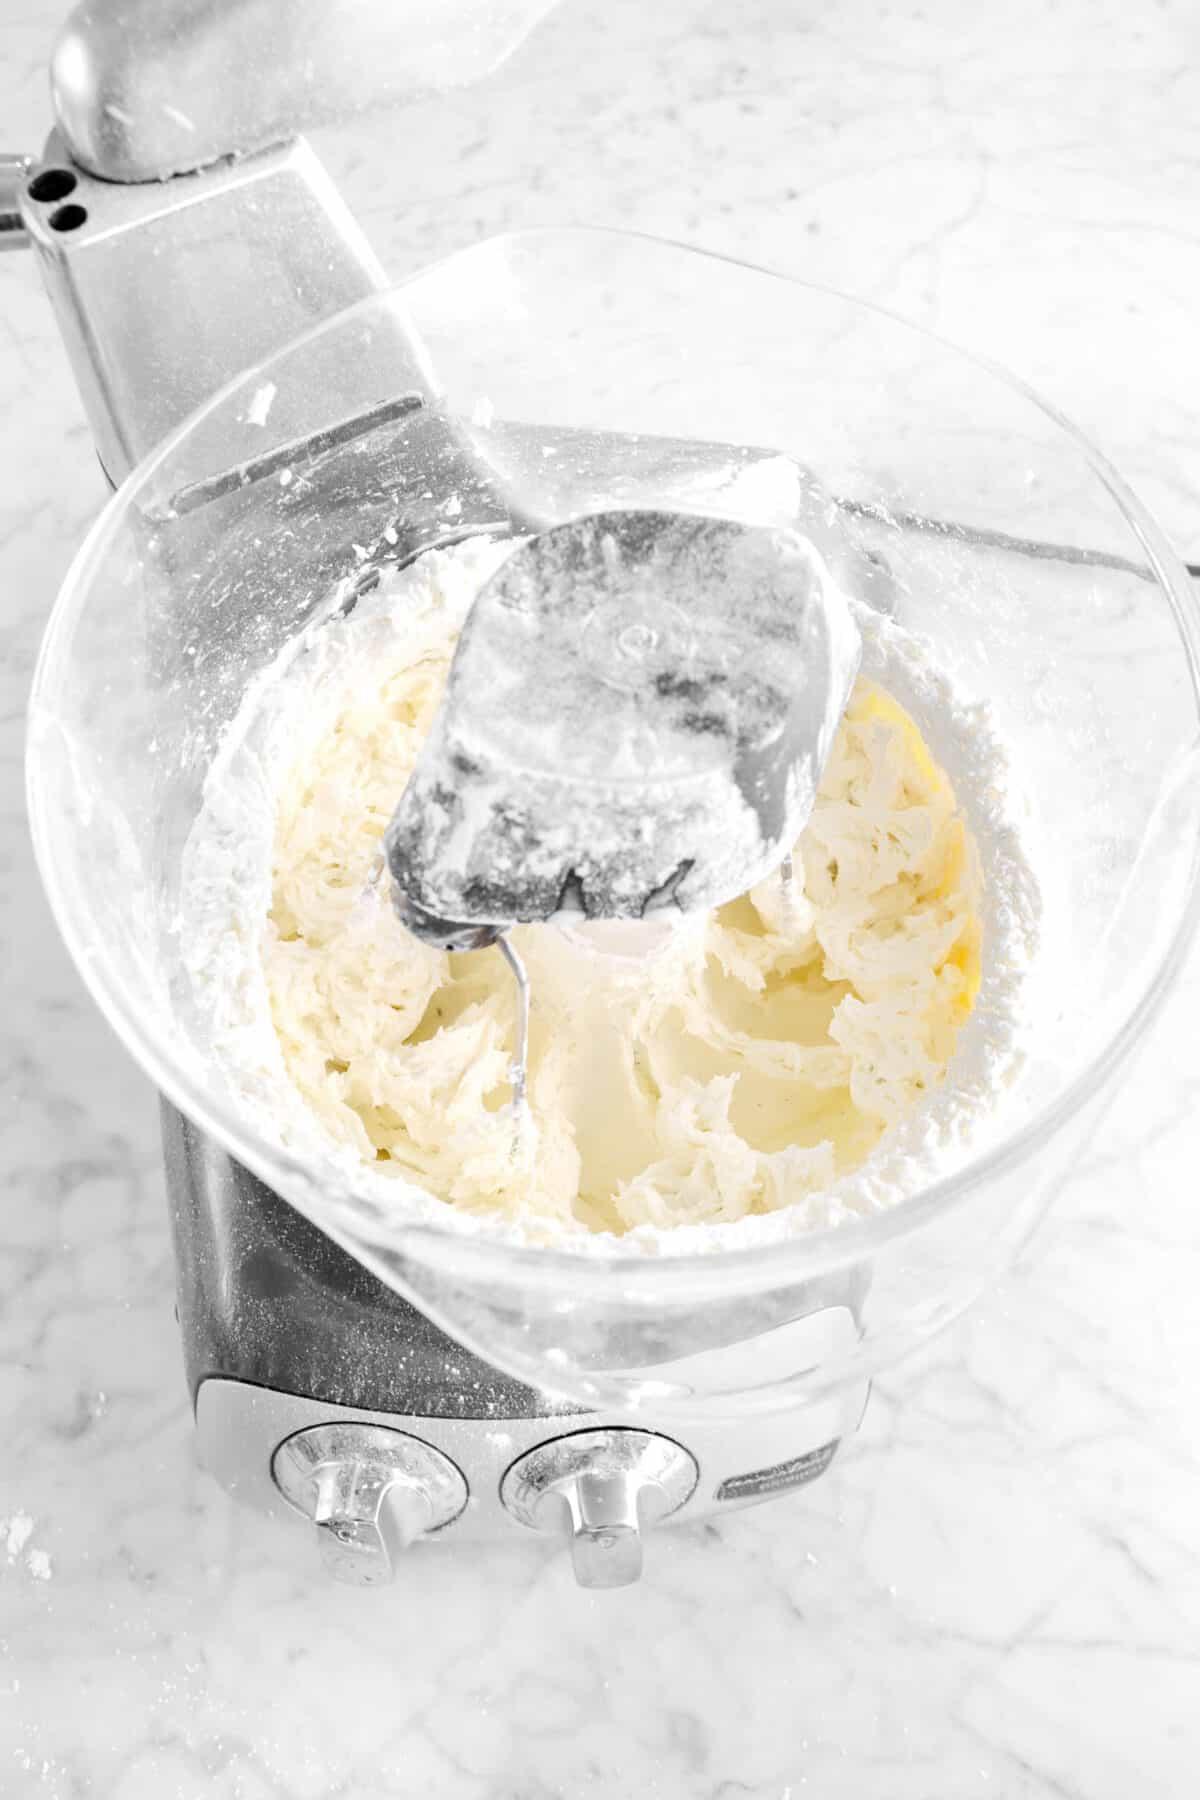 vanilla and cream stirred into butter mixture